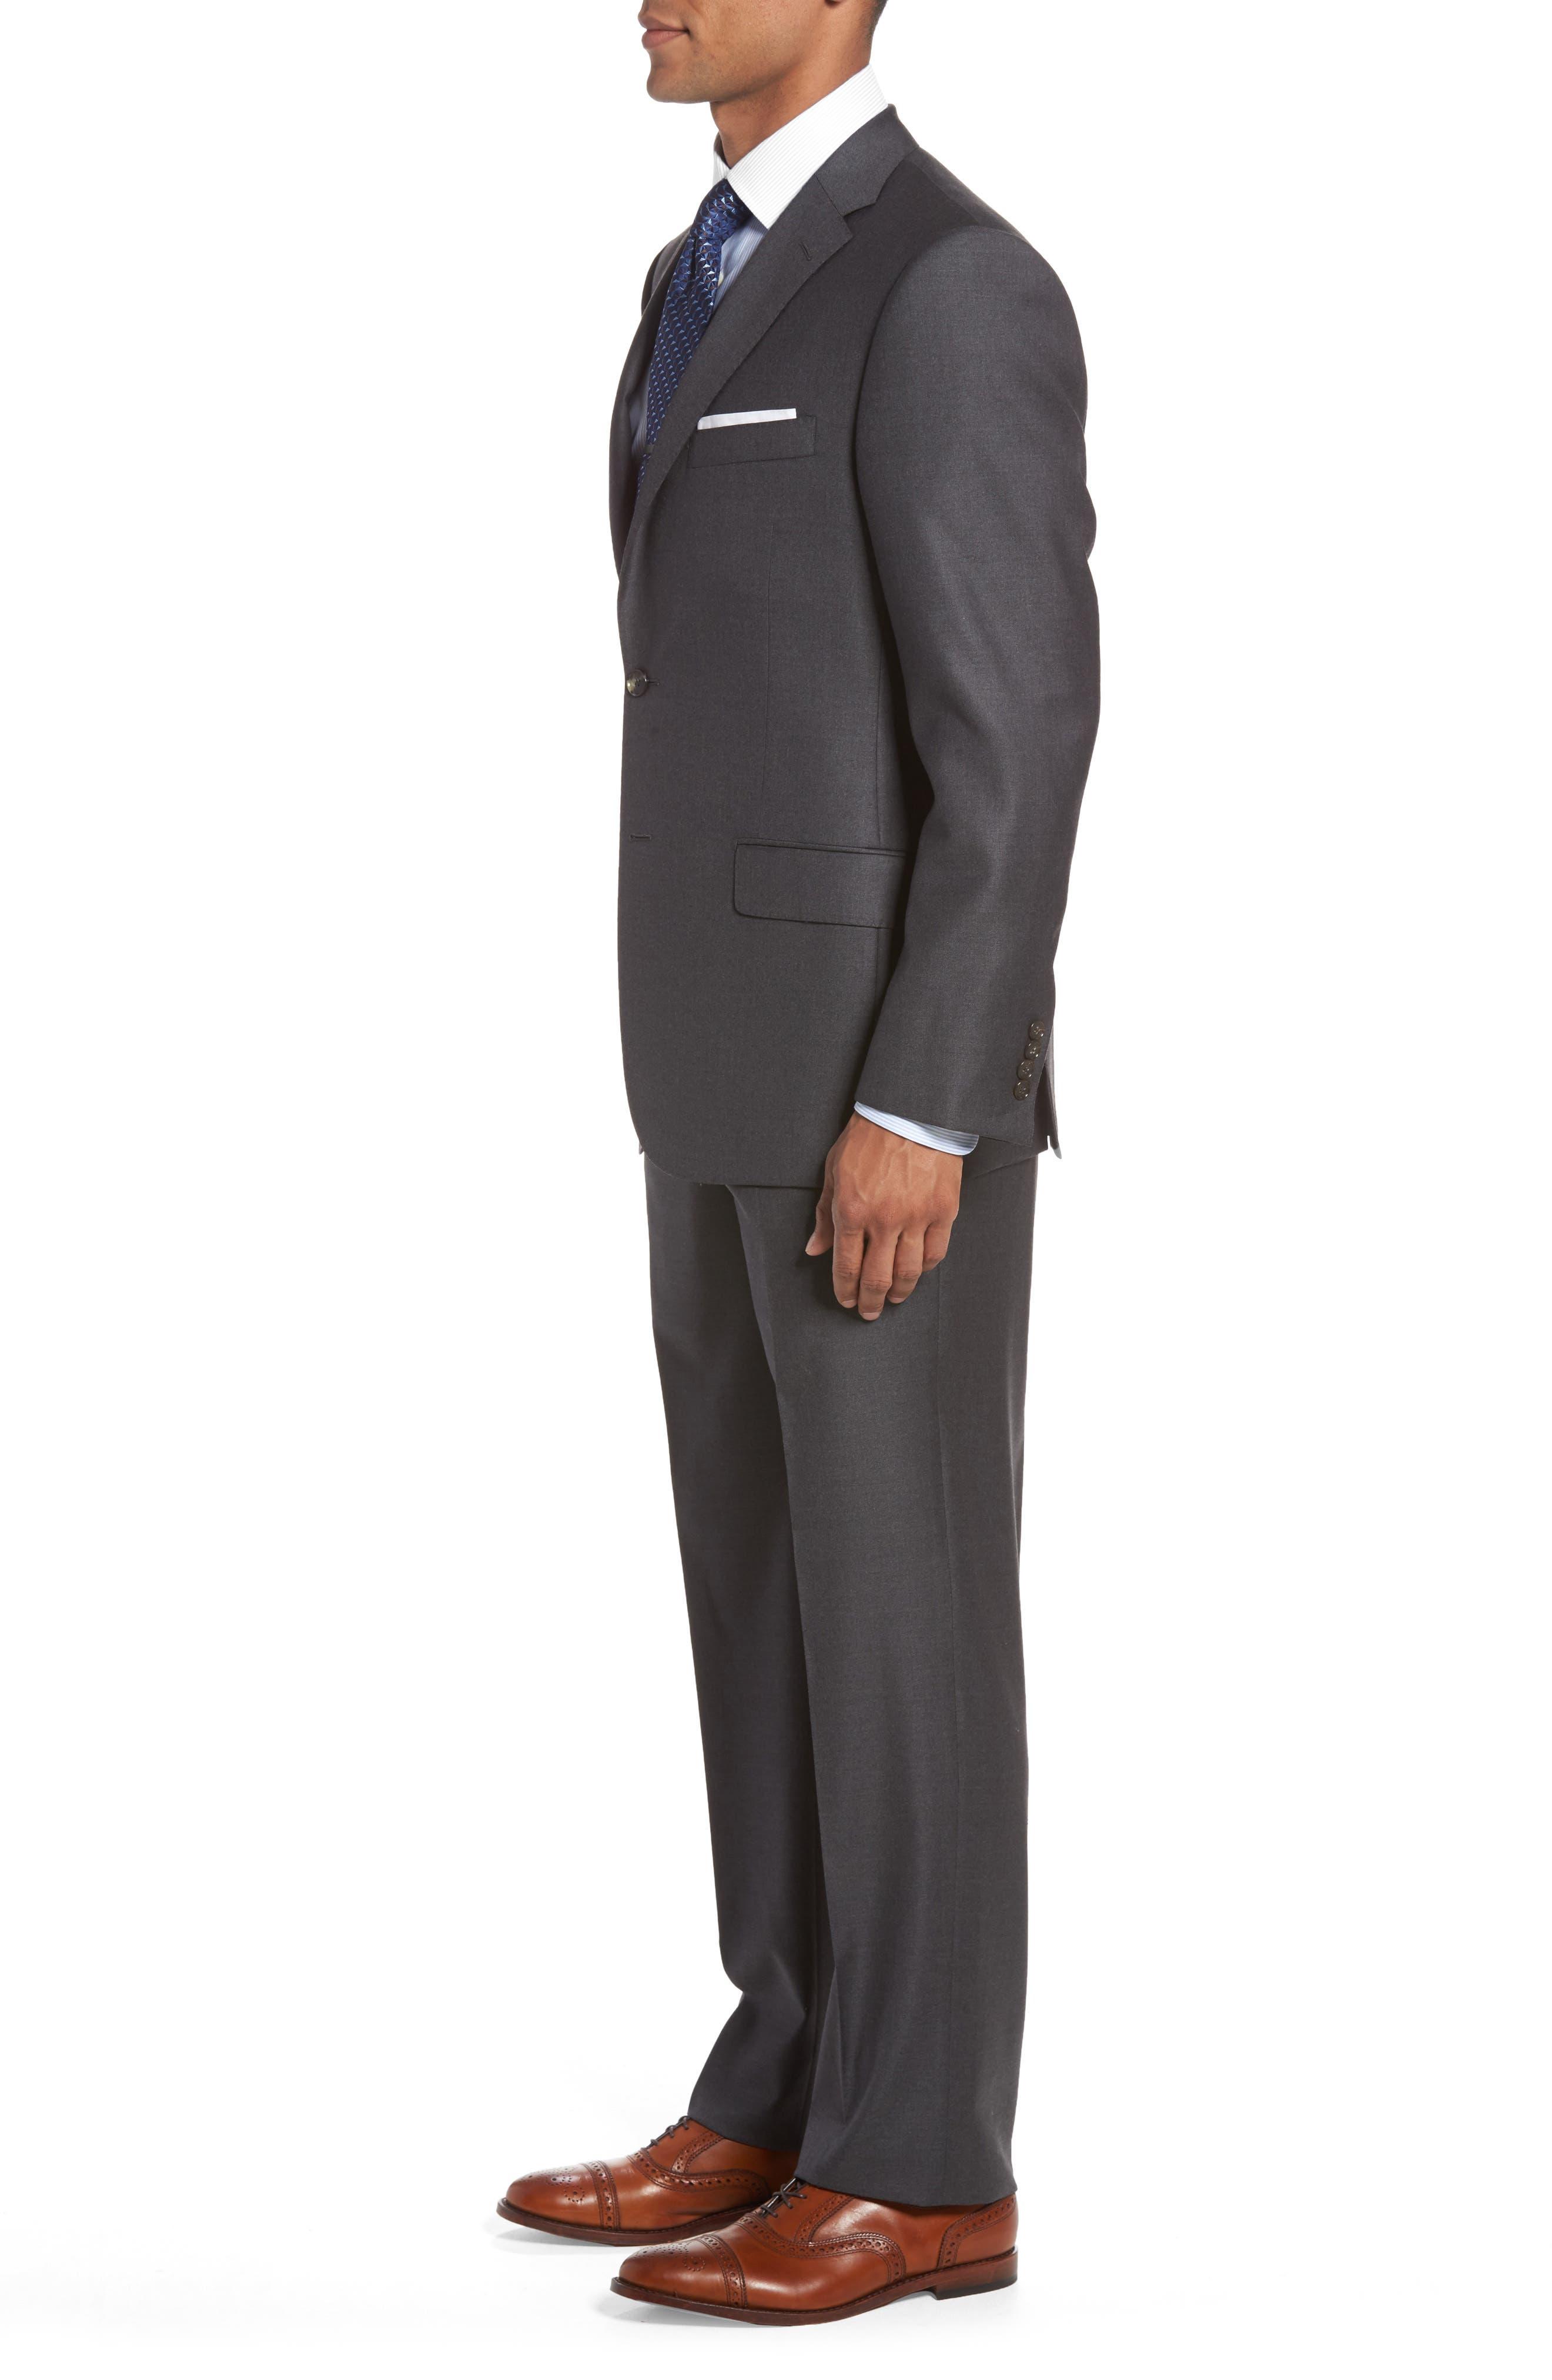 HICKEY FREEMAN, Classic B Fit Loro Piana Wool Suit, Alternate thumbnail 3, color, GREY